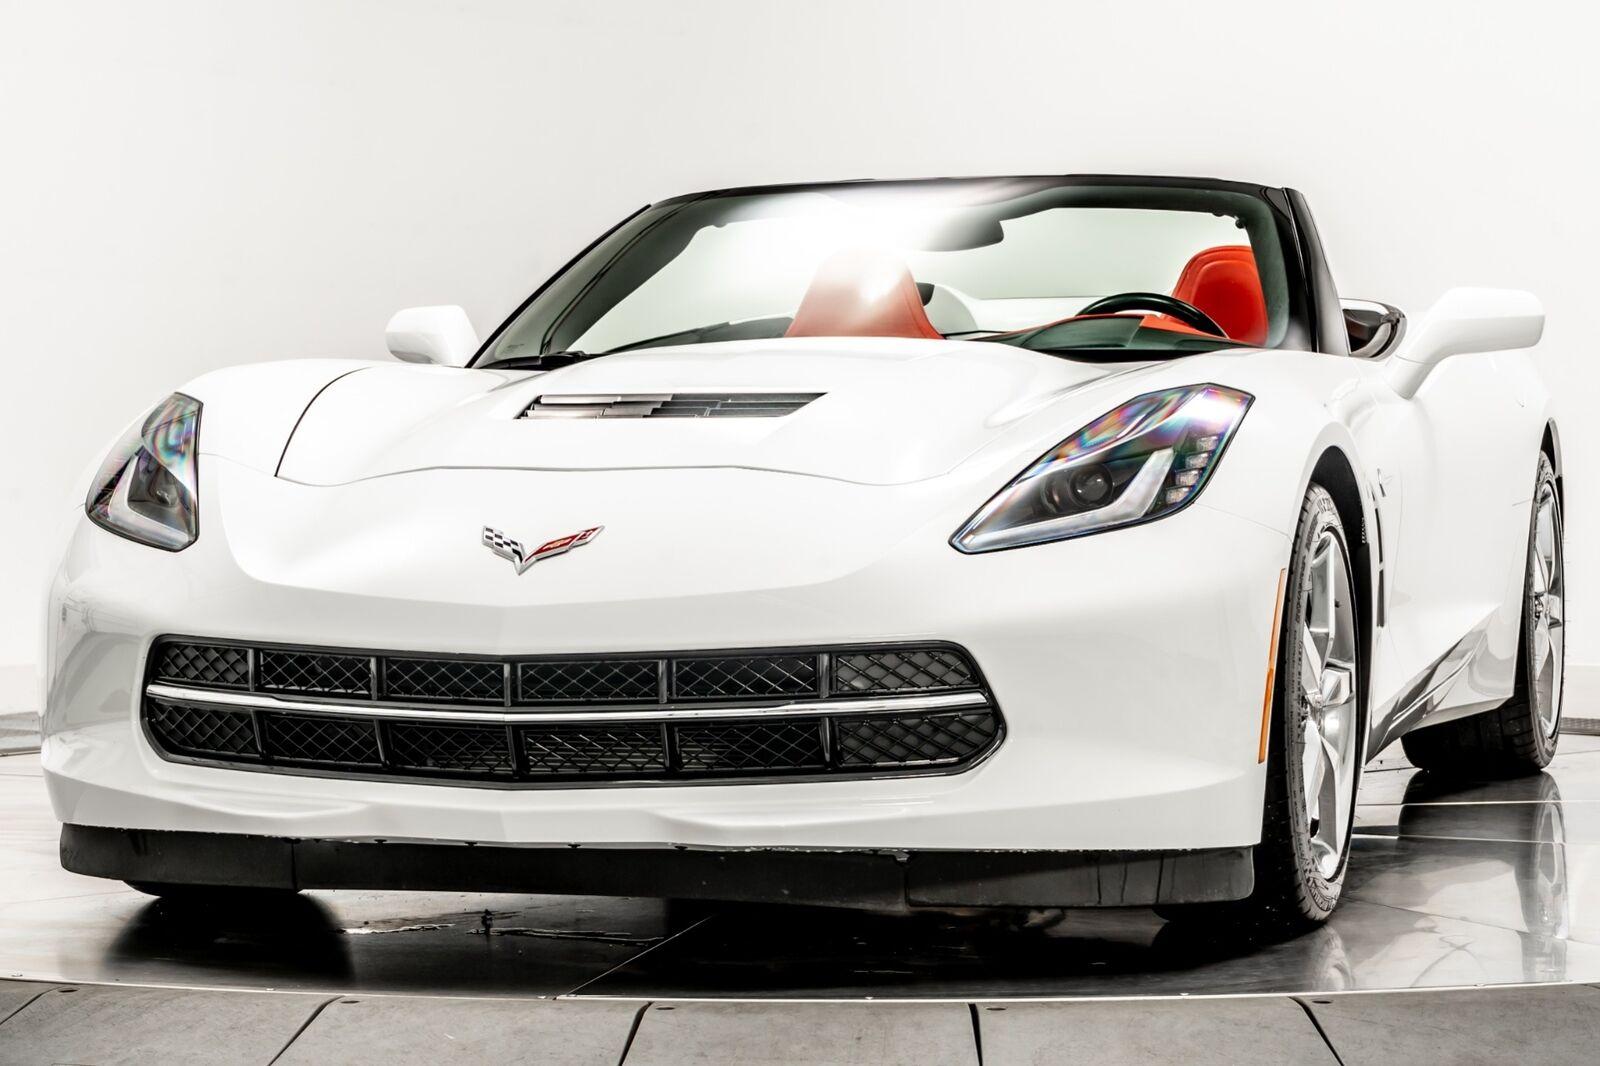 2015 White Chevrolet Corvette Convertible 3LT   C7 Corvette Photo 4